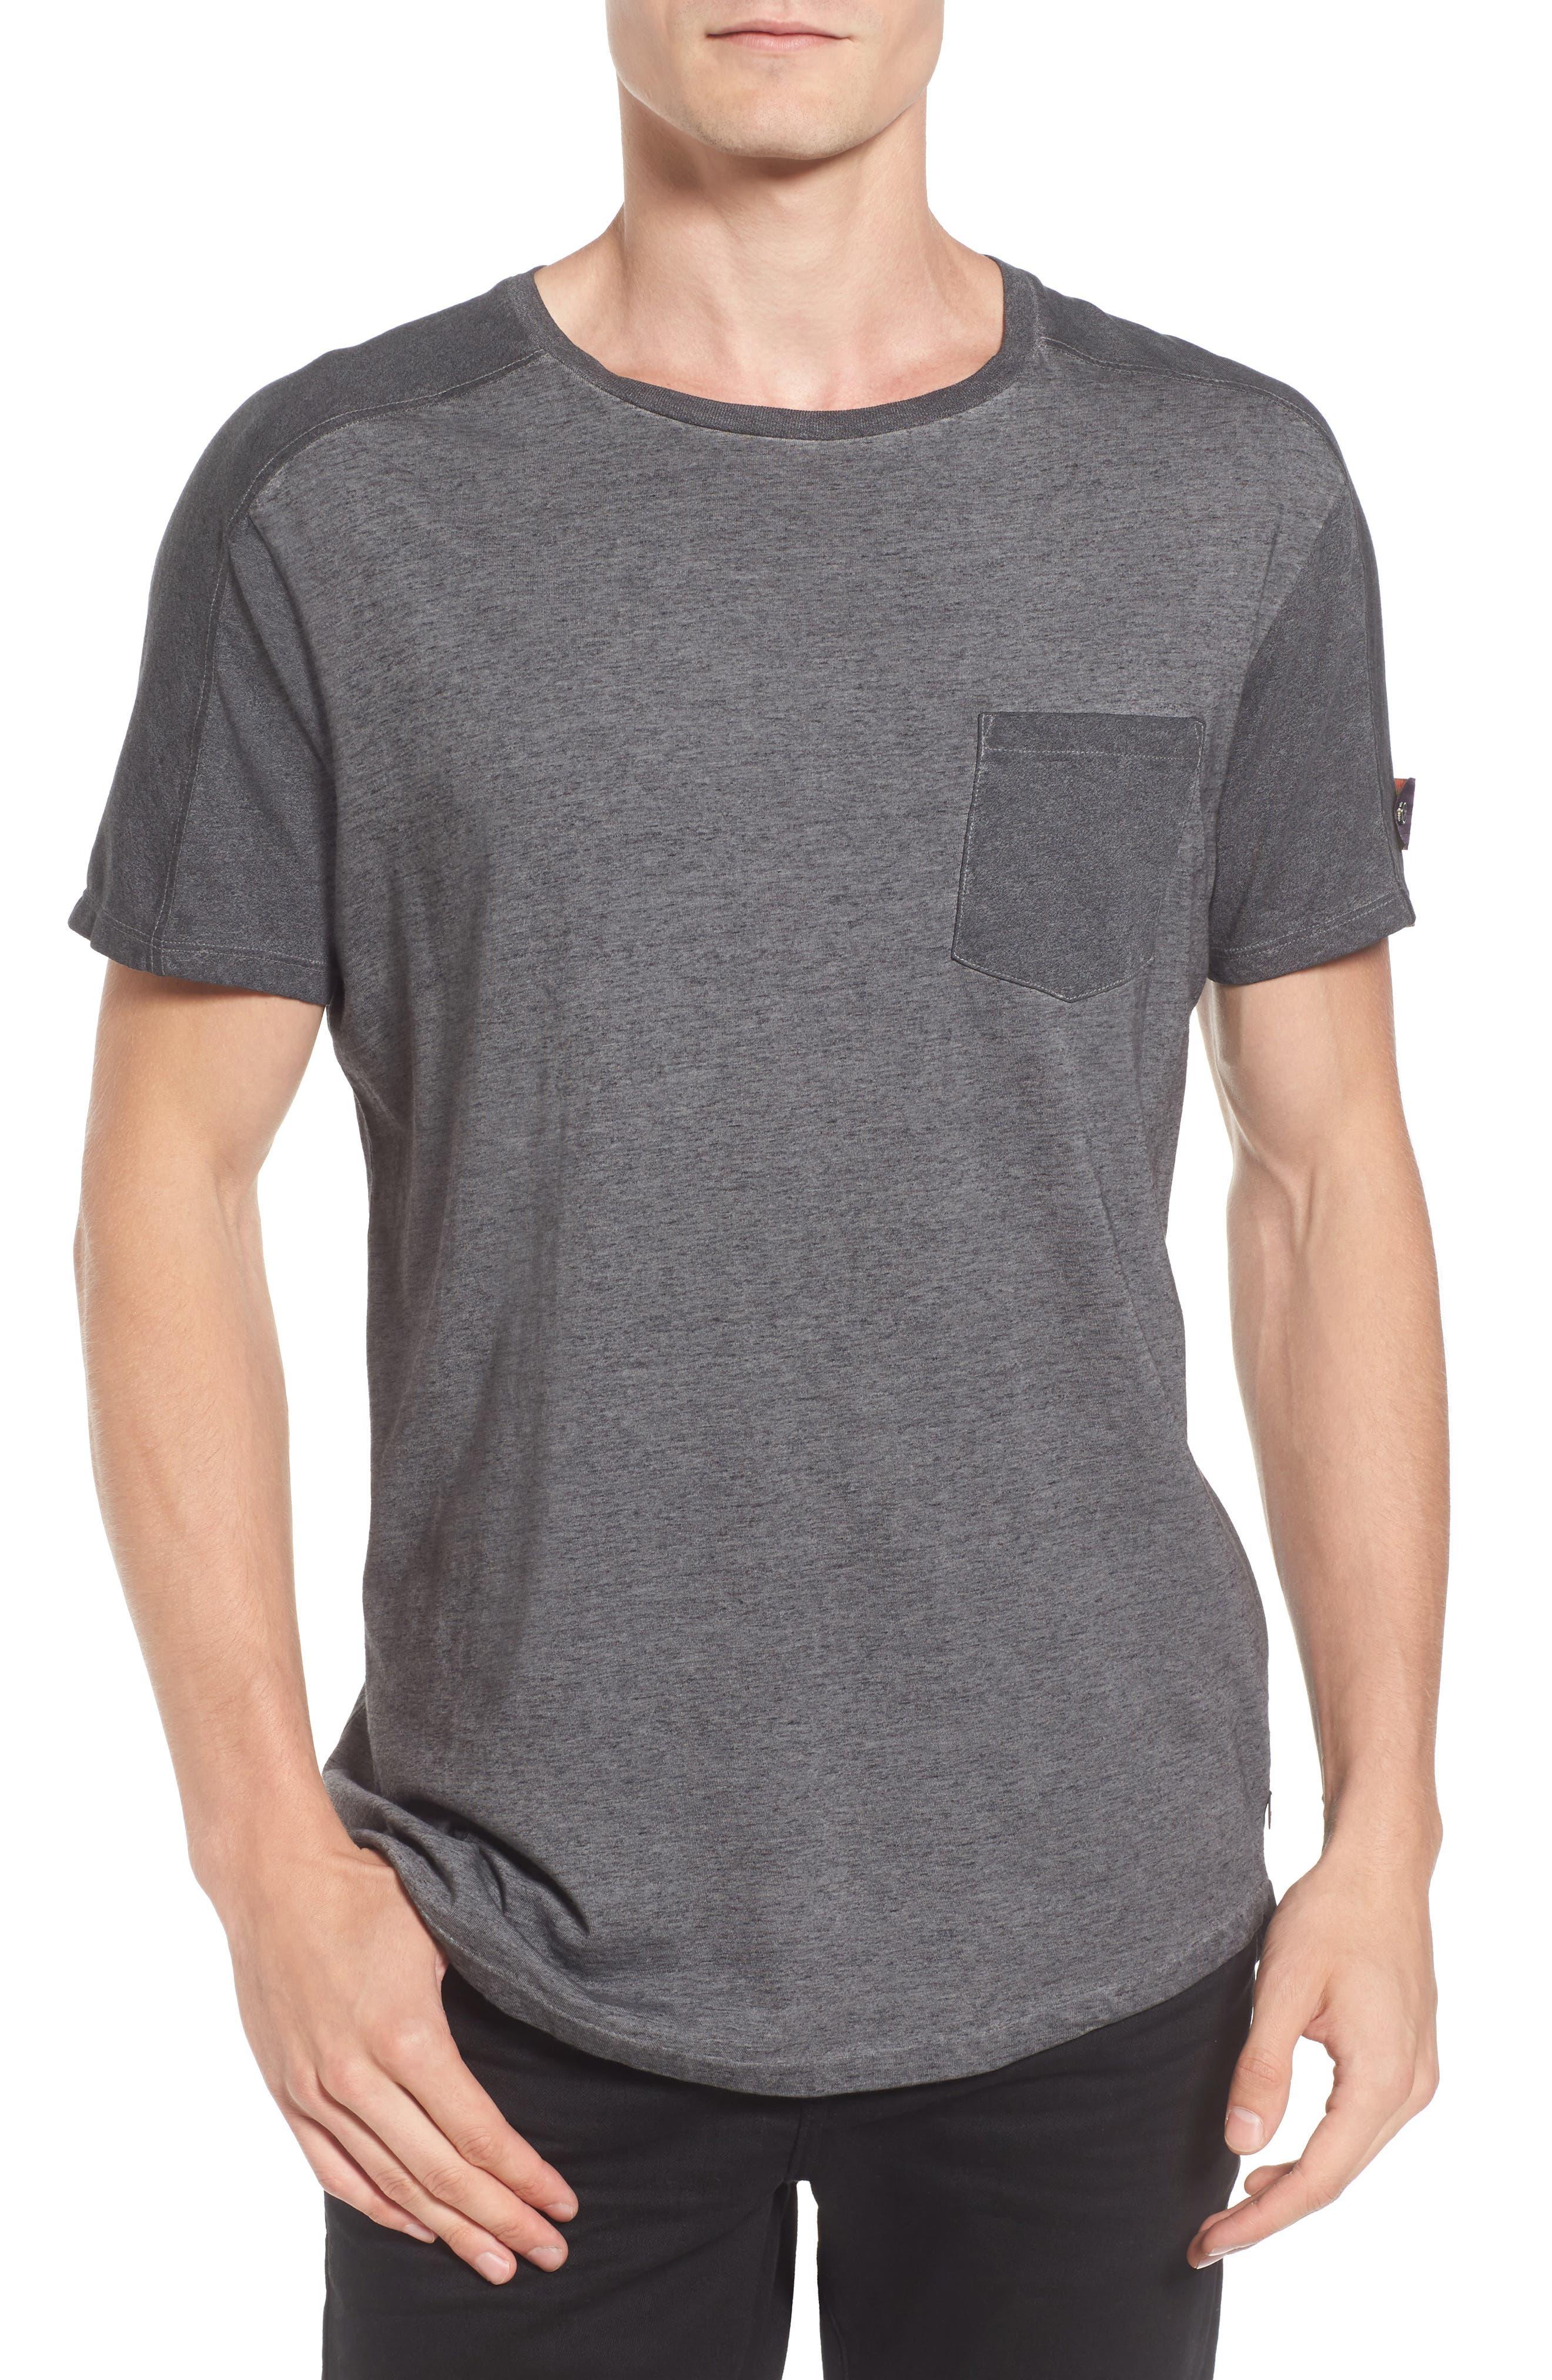 Scotch & Soda Oil-Washed Pocket T-Shirt